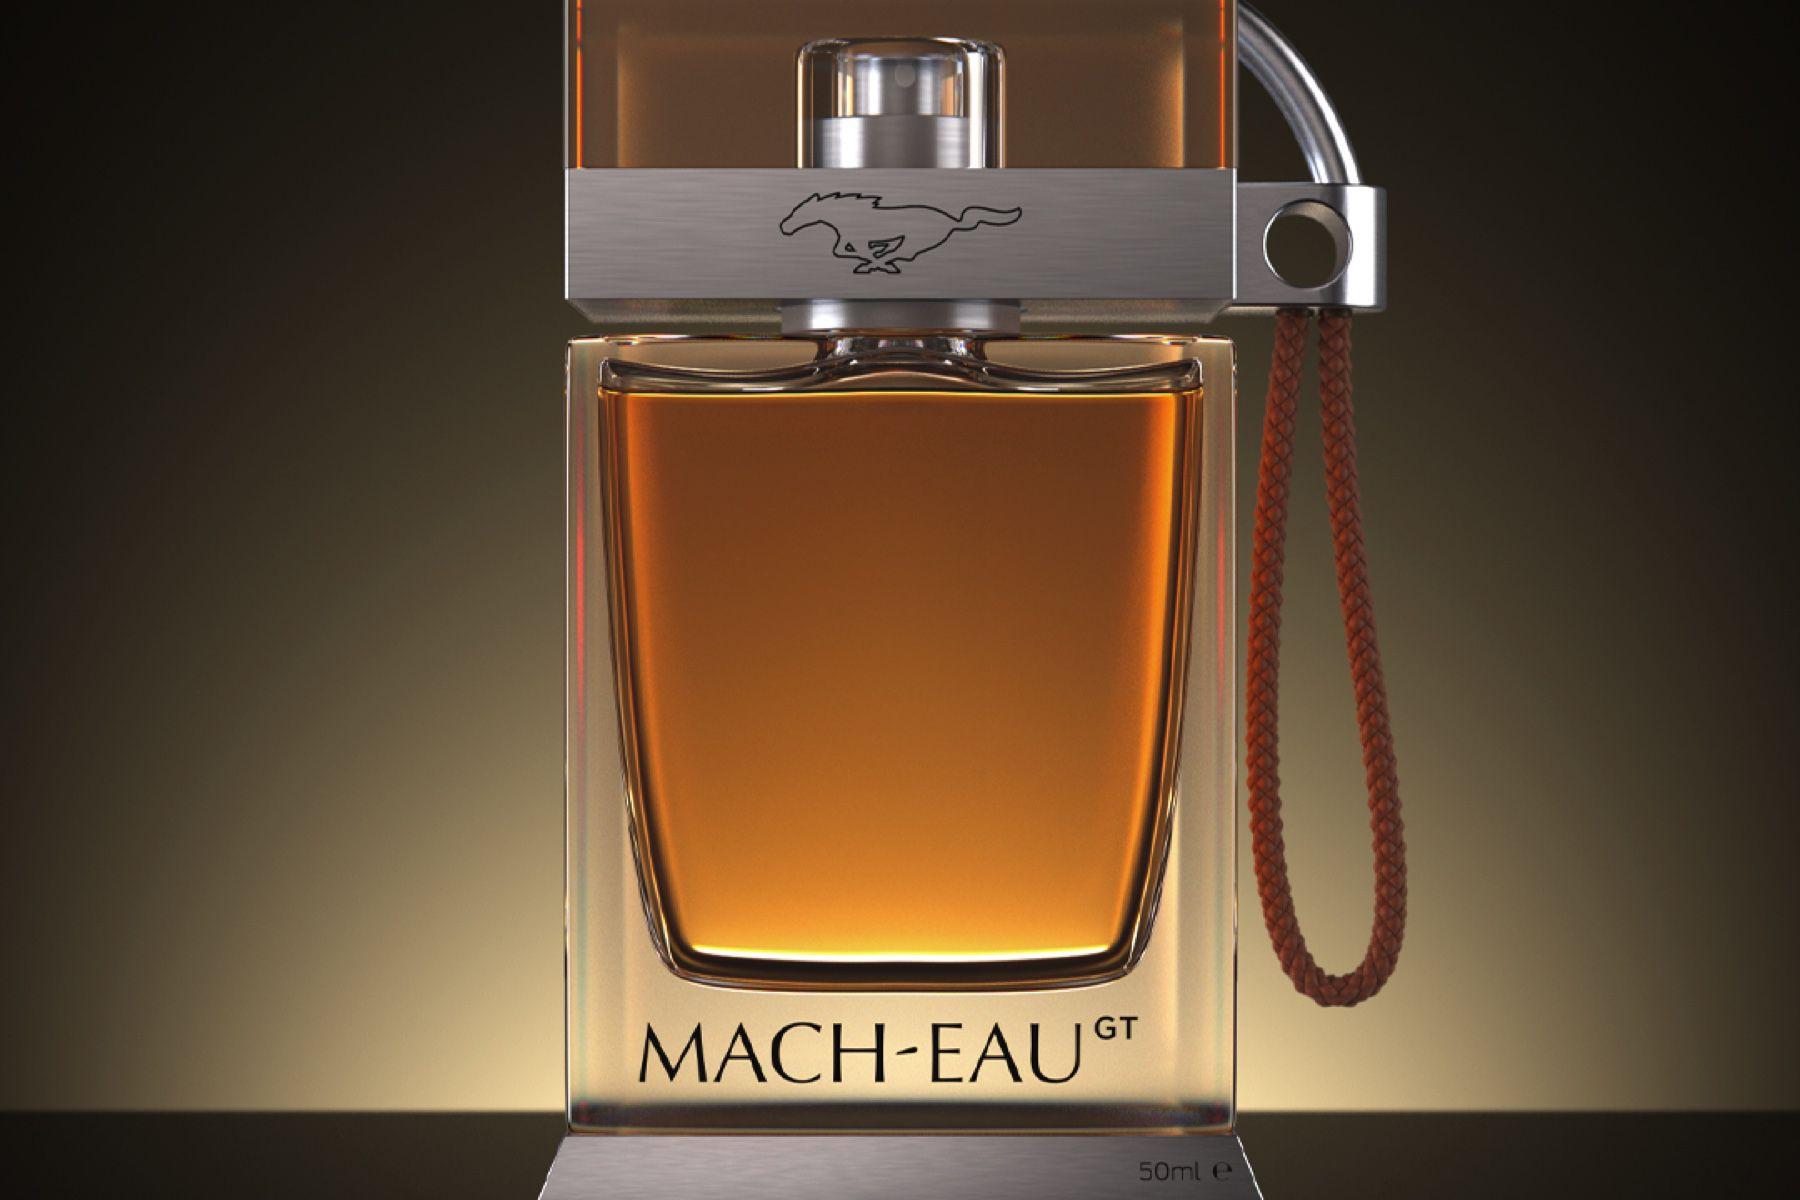 Wangi Bensin Jadi Aroma Parfum Baru yang Dirilis Ford